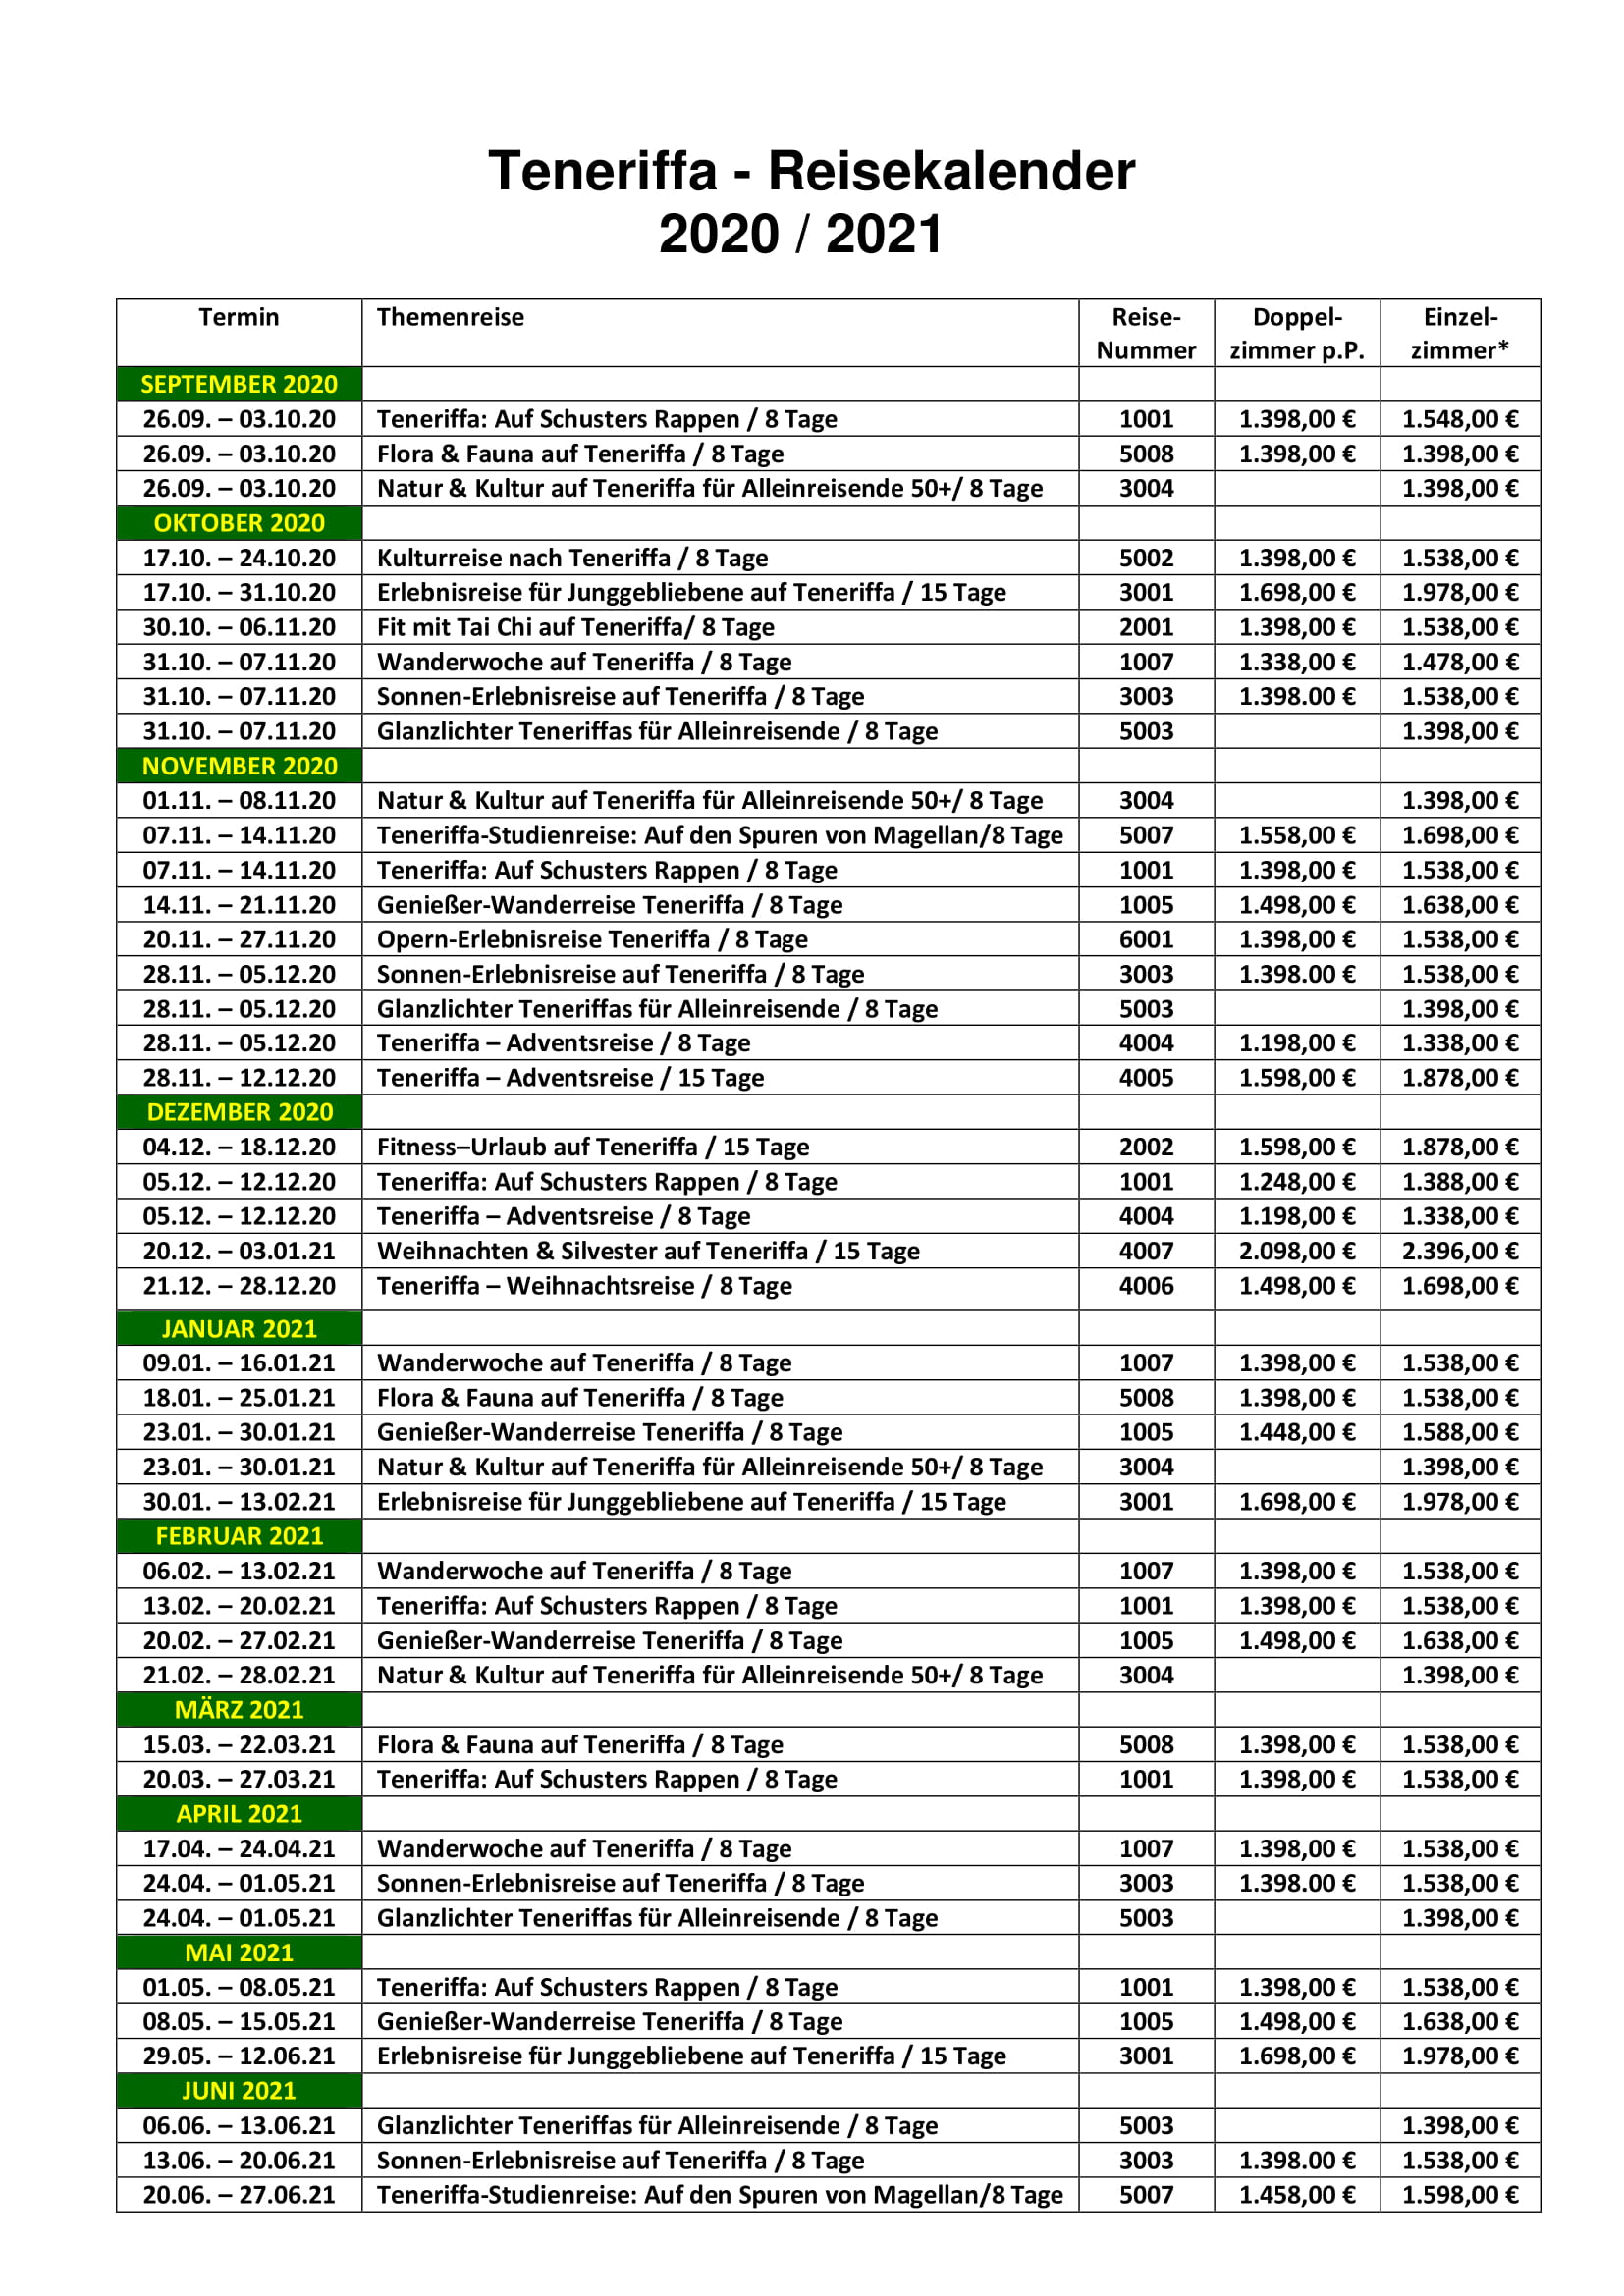 Reisekalender2020/2021-1